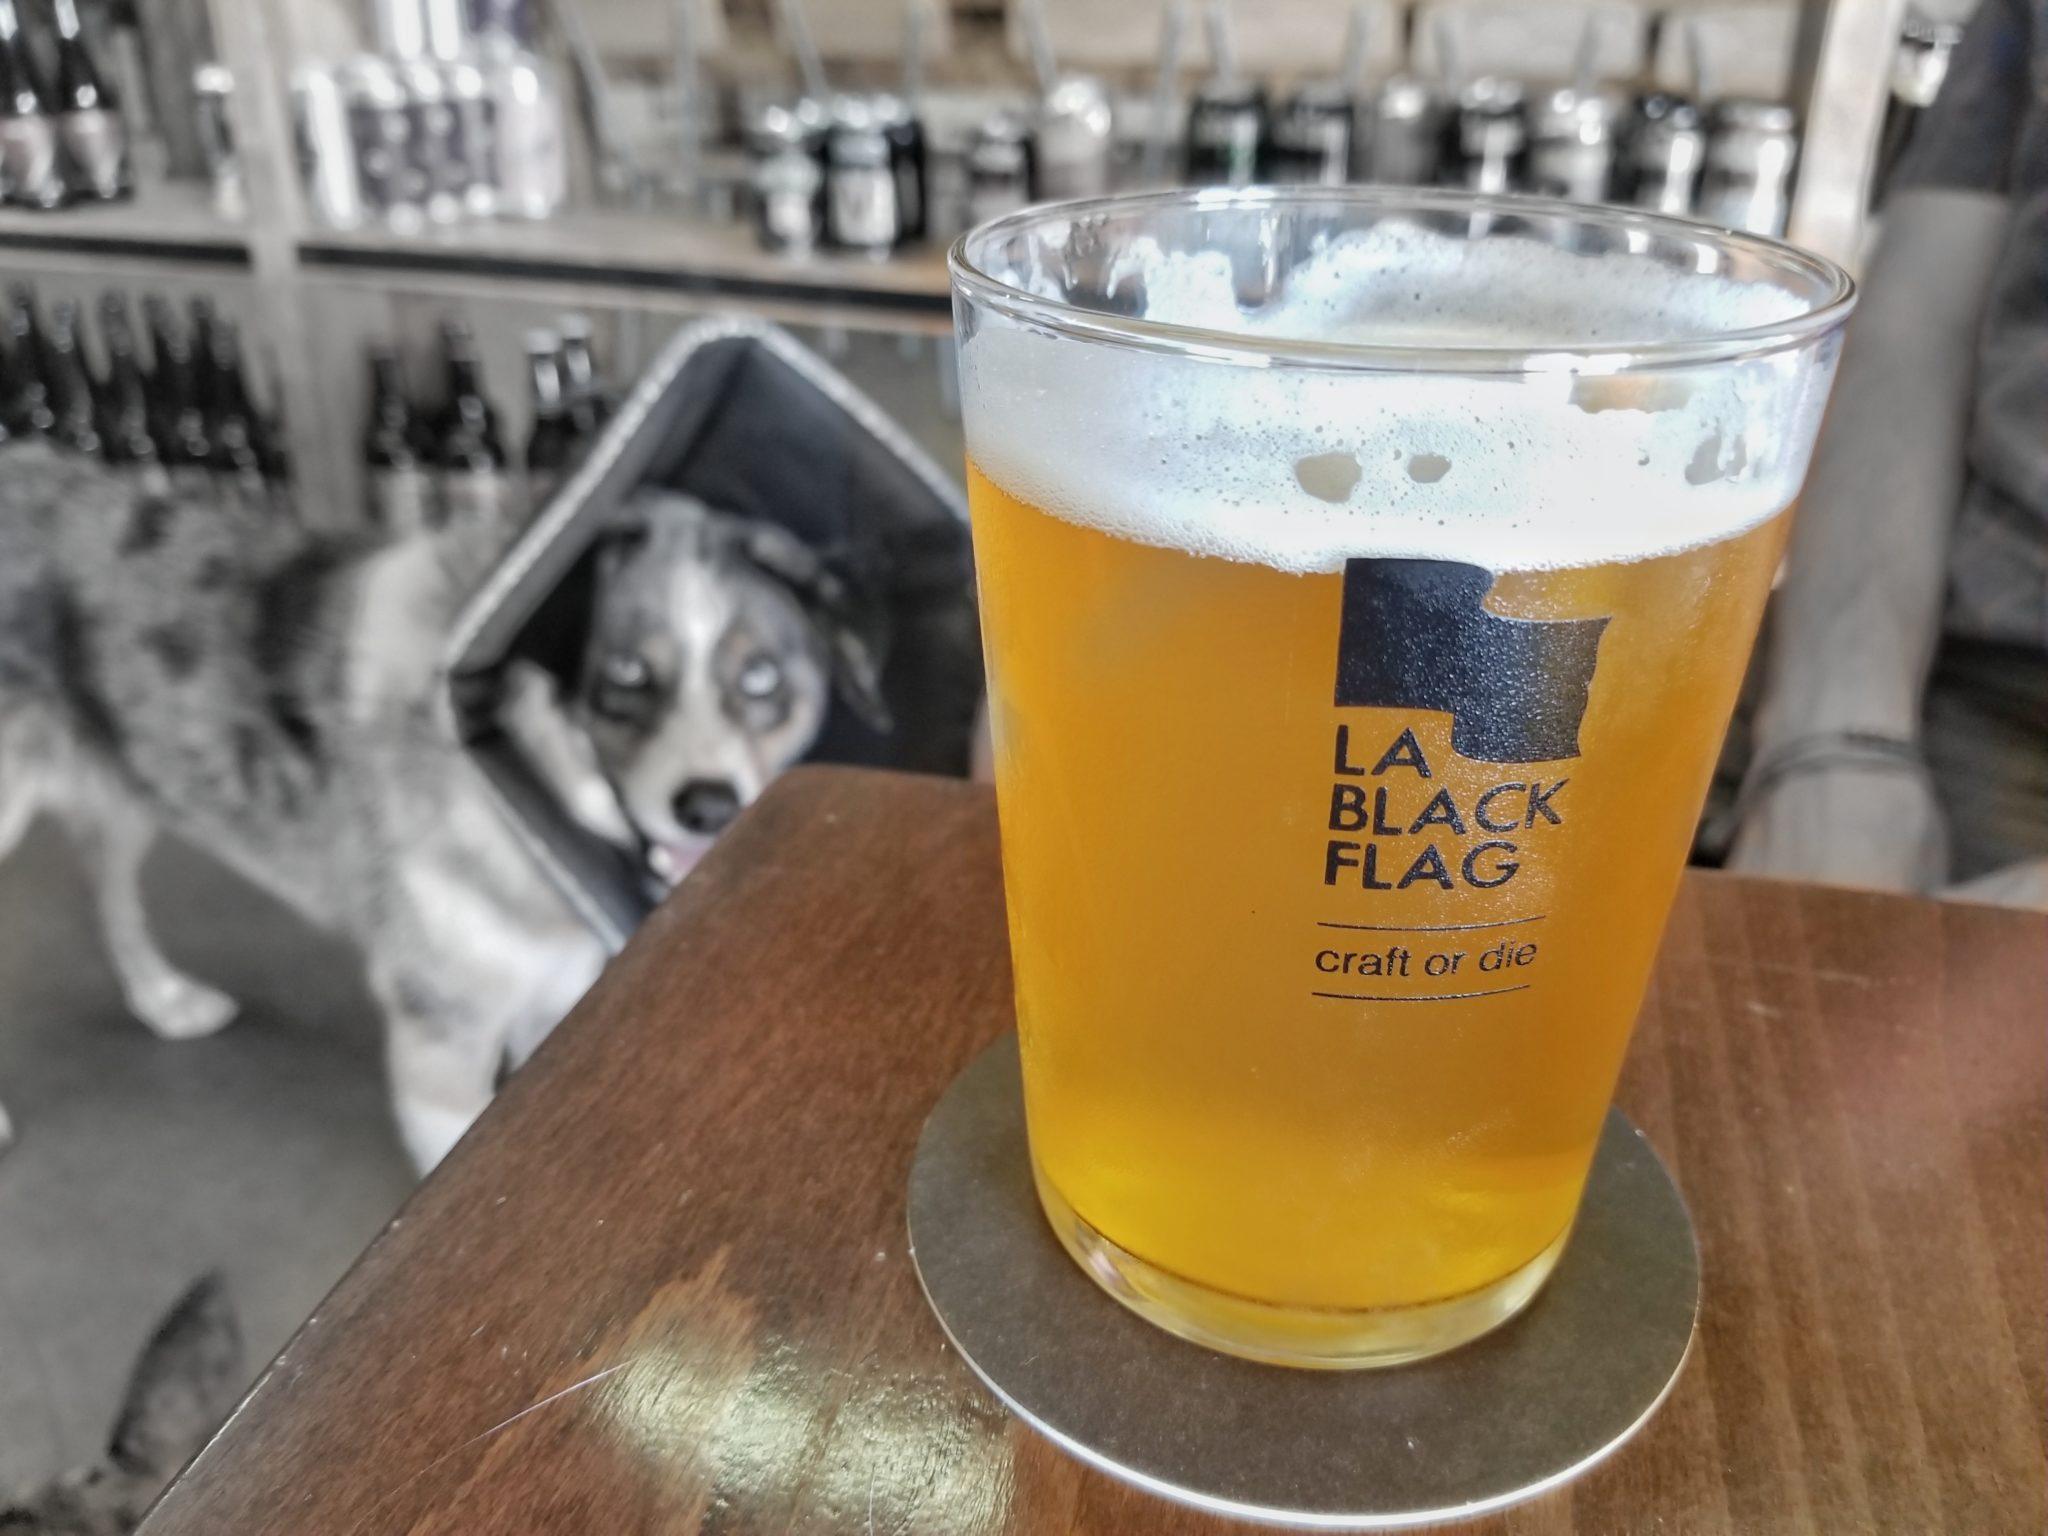 Visit La Black Flag, a dog-friendly brewery in Girona, Spain.